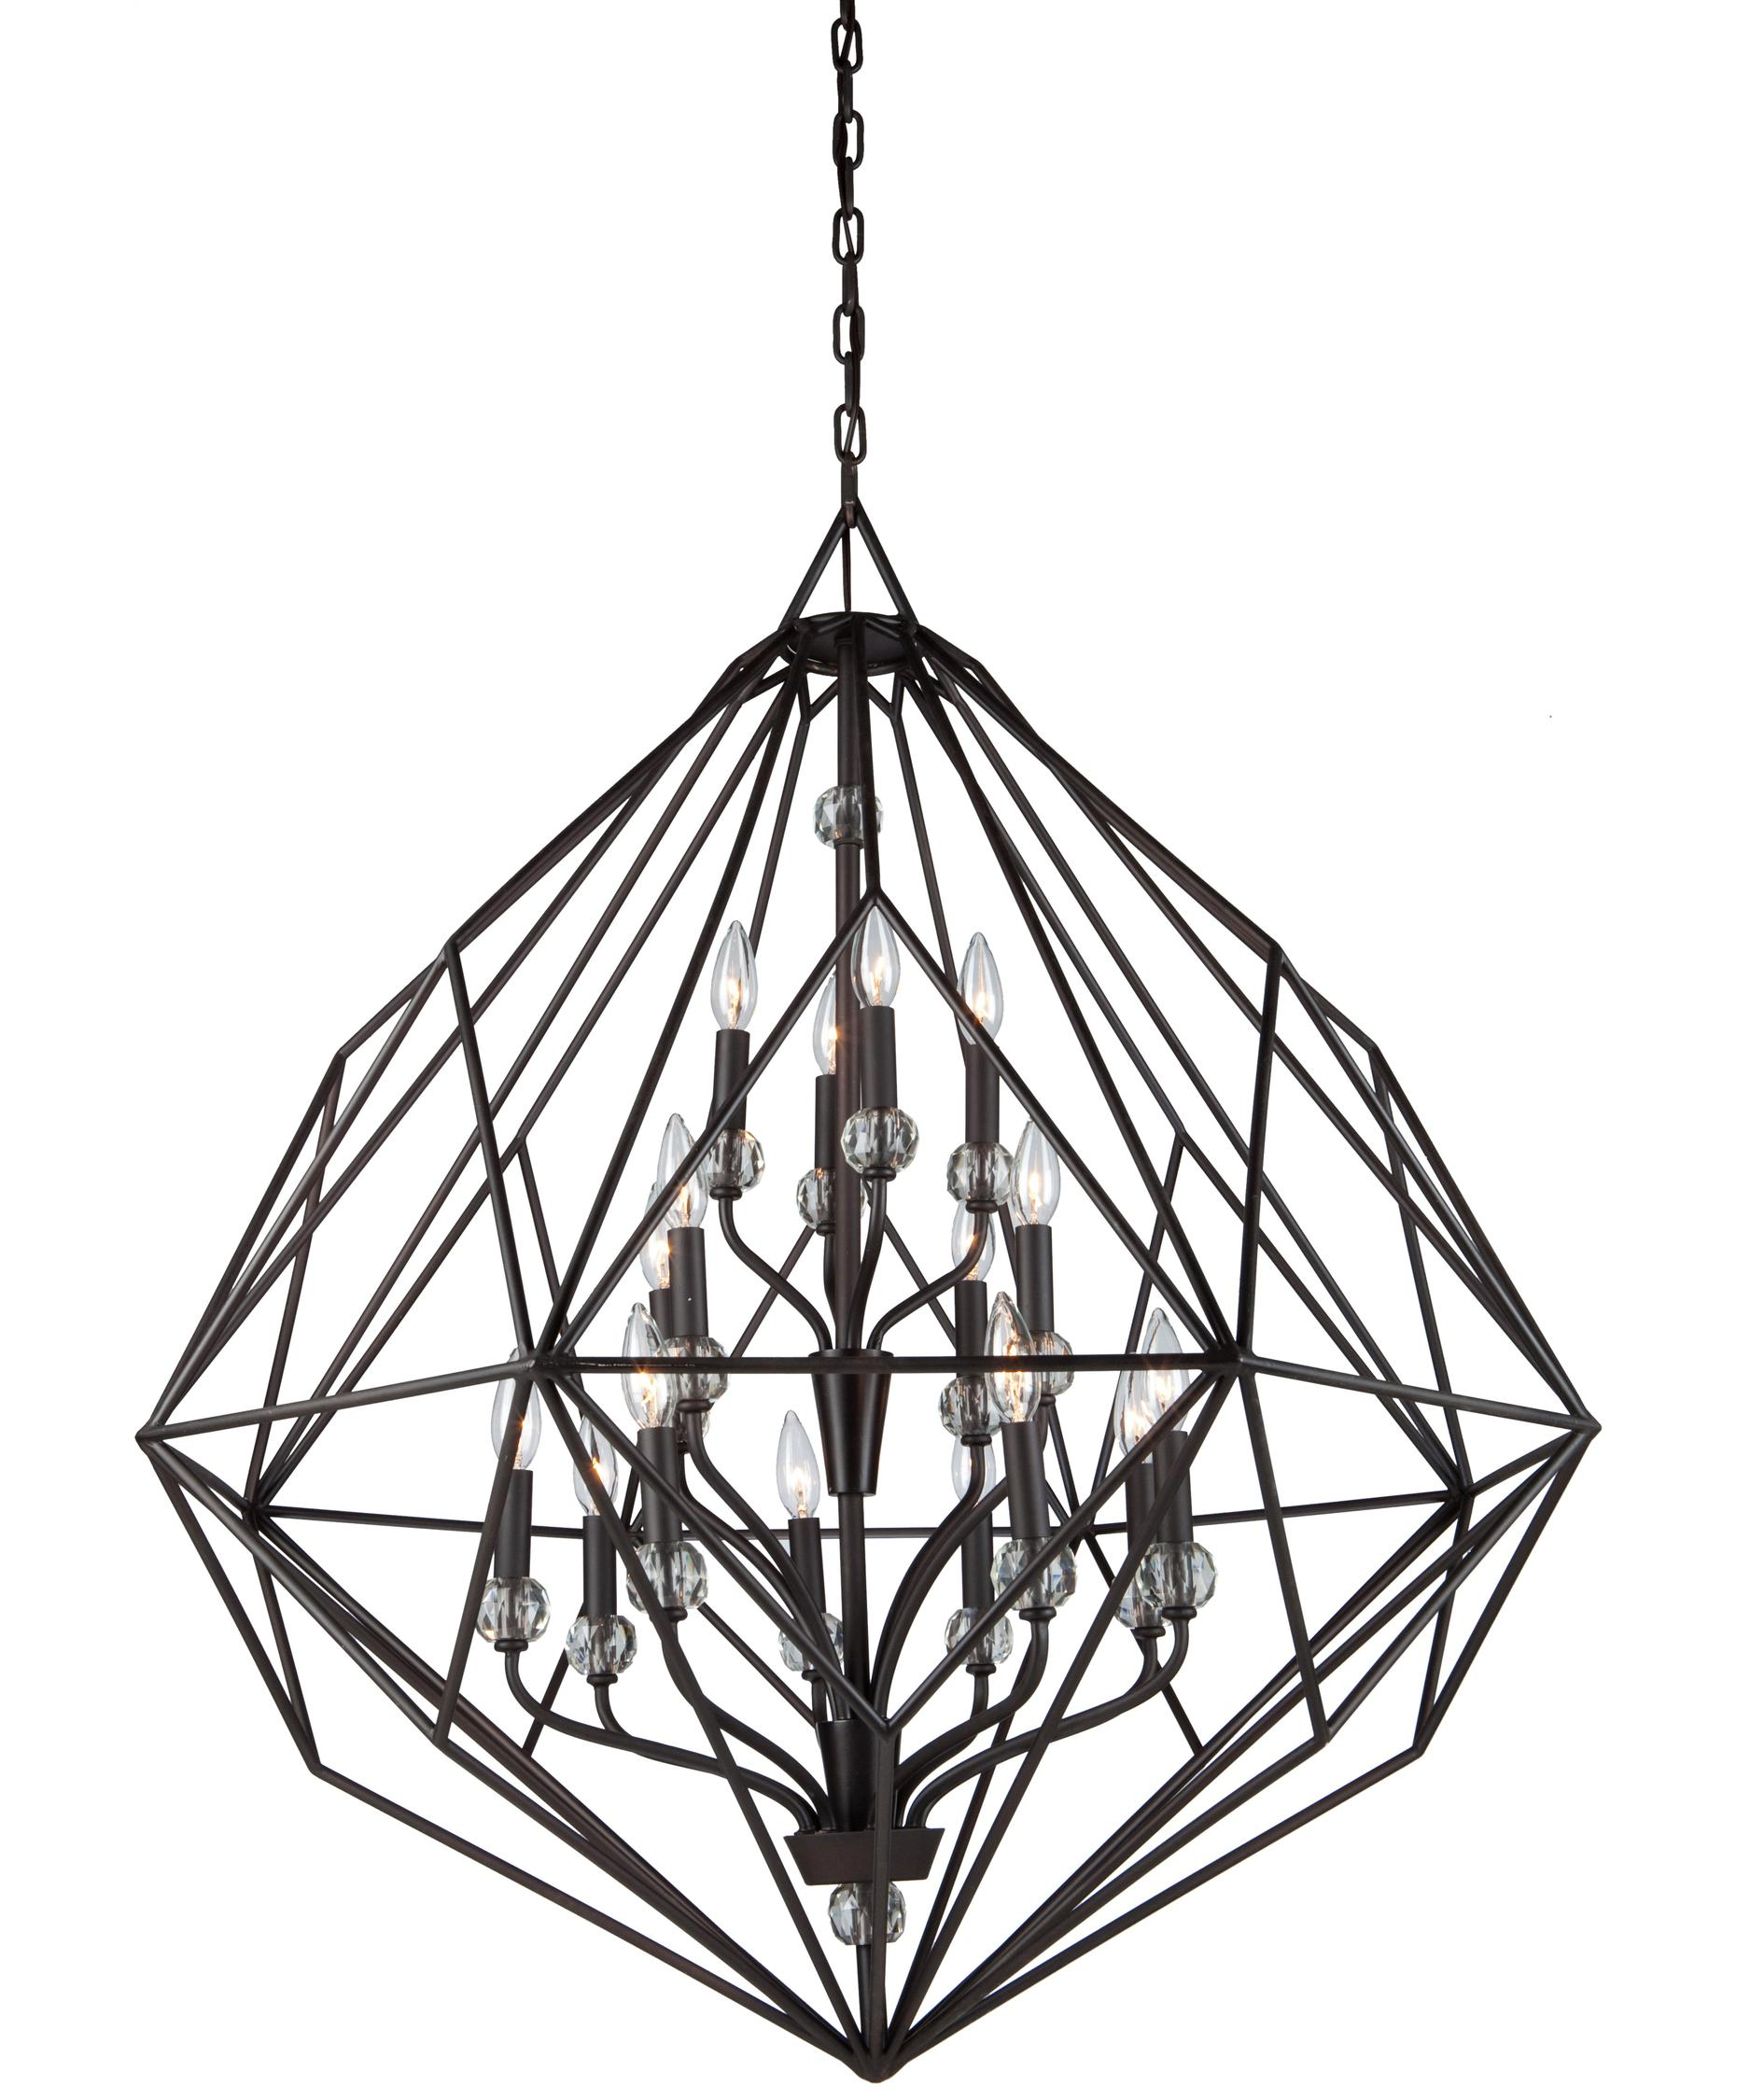 1875x2250 Ideas Unique Interior Lights Design With Artcraft Lighting